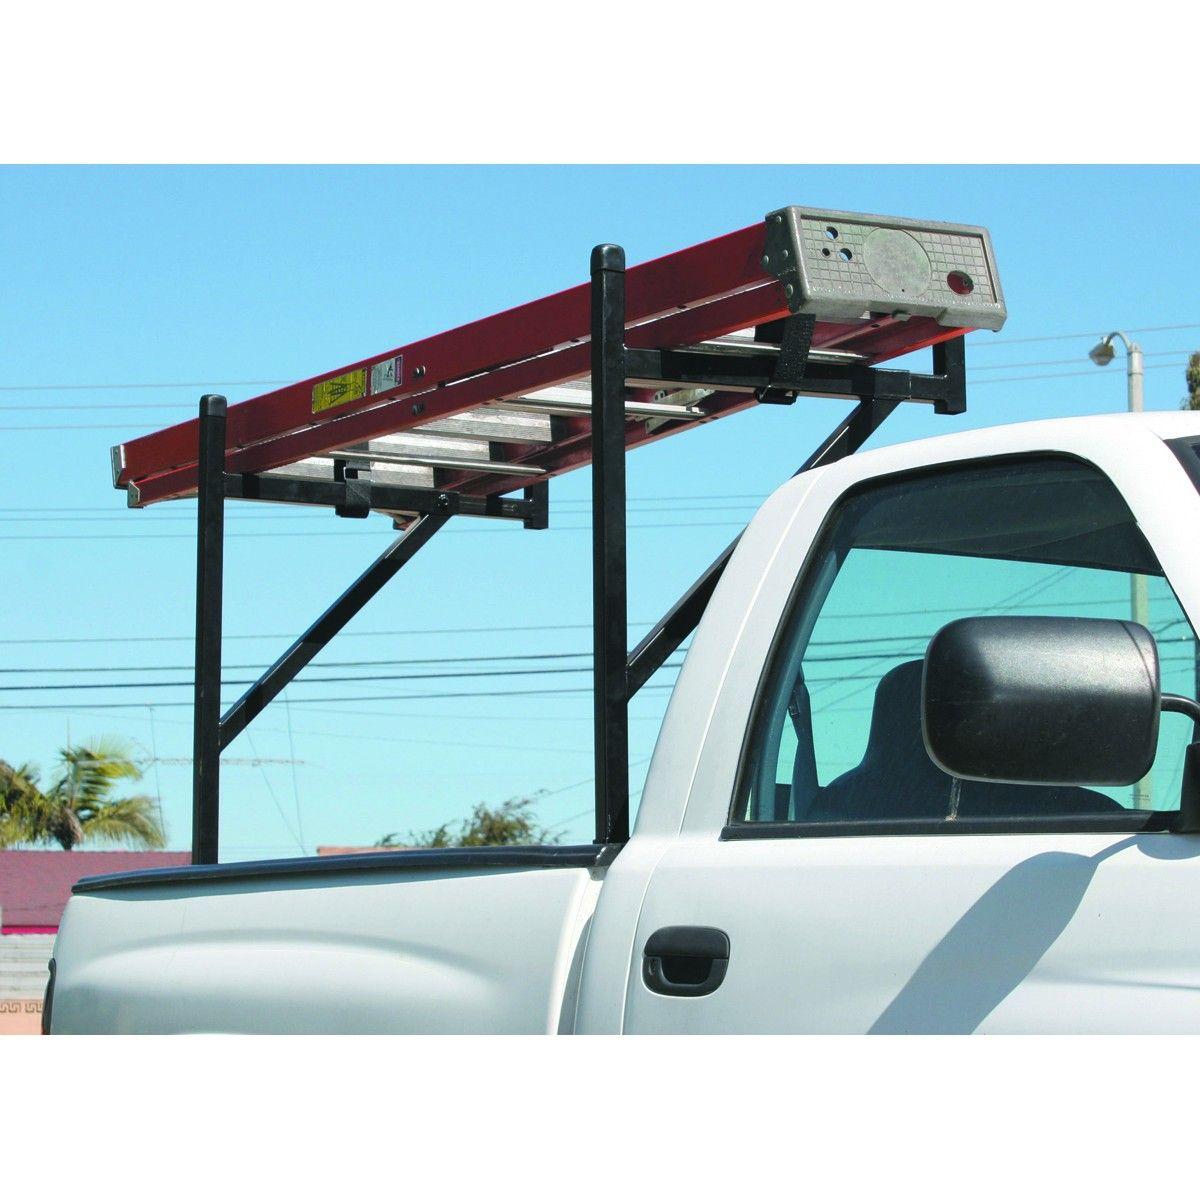 250 lb. Capacity Truck Ladder Rack Truck bed, Ladder